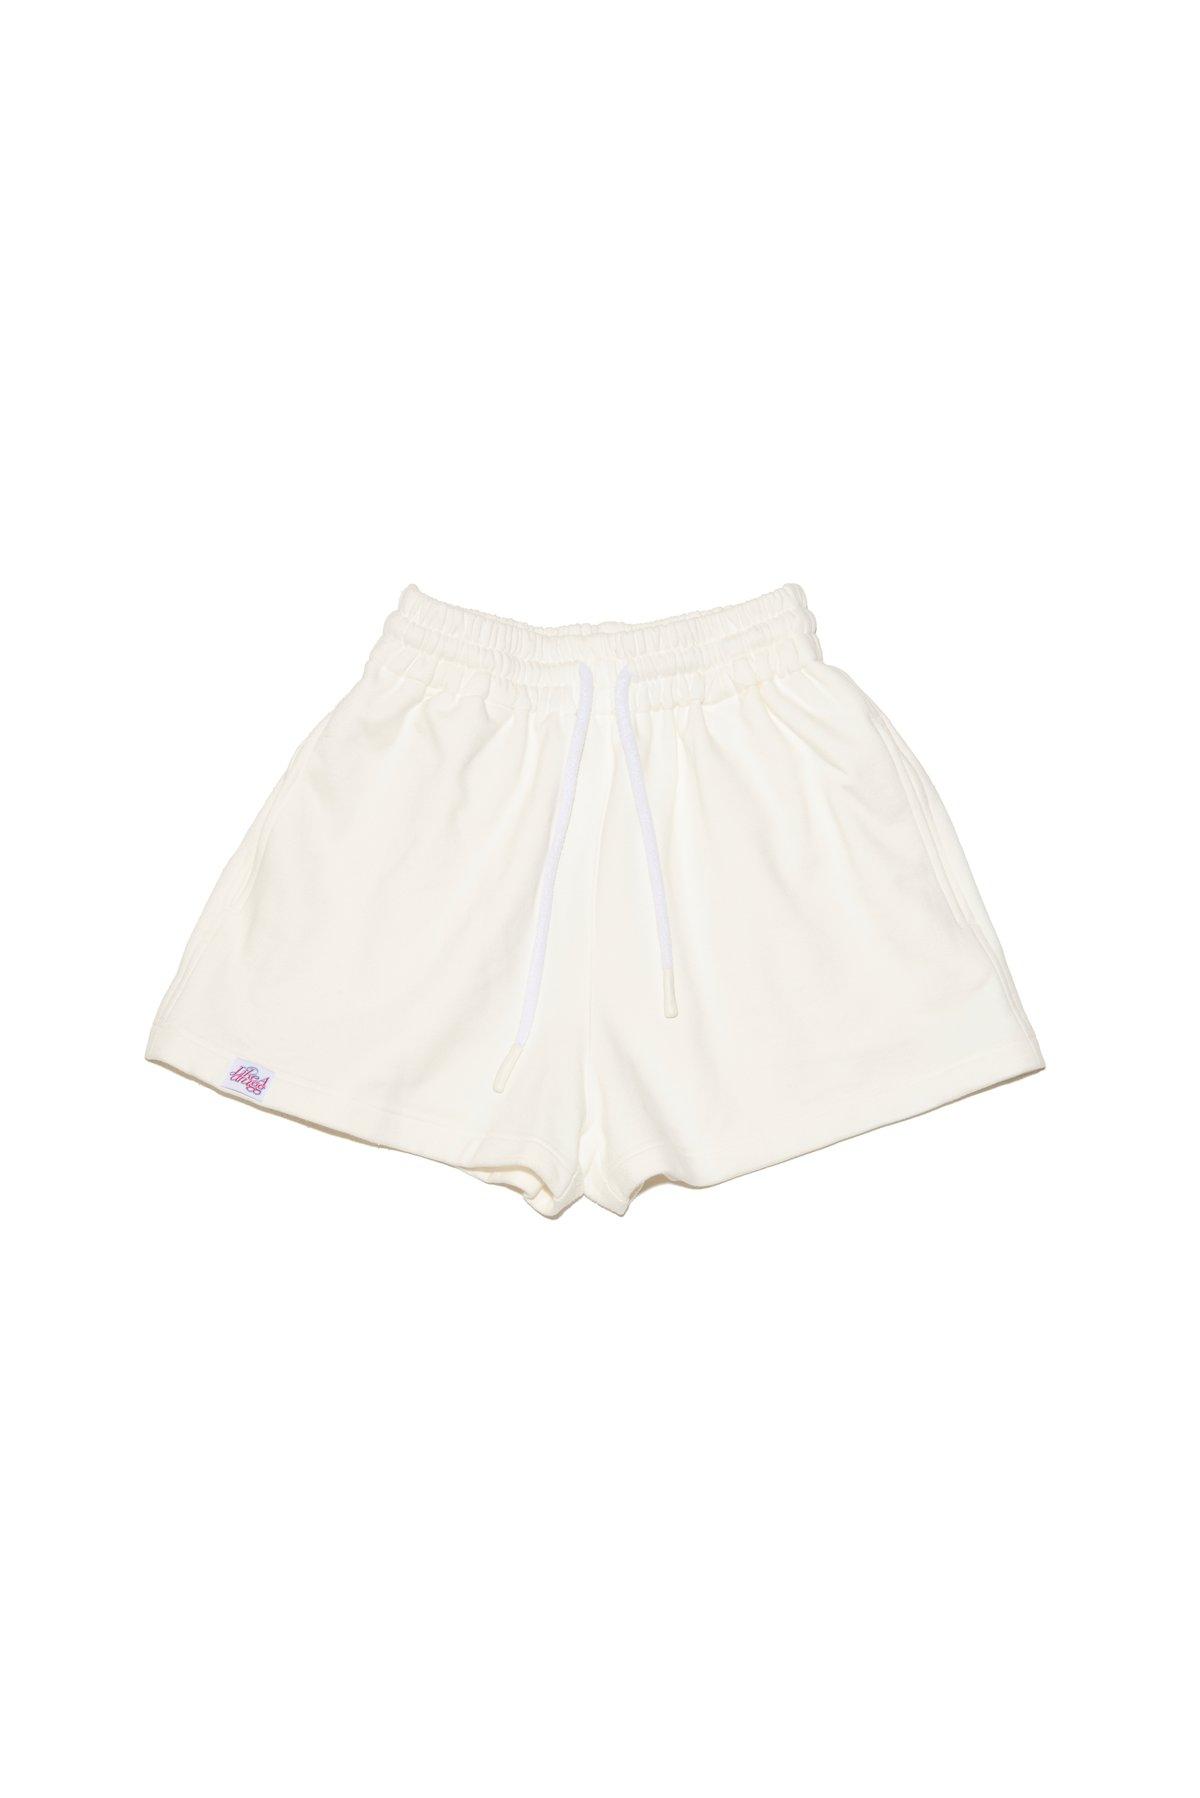 White Ivory shorts